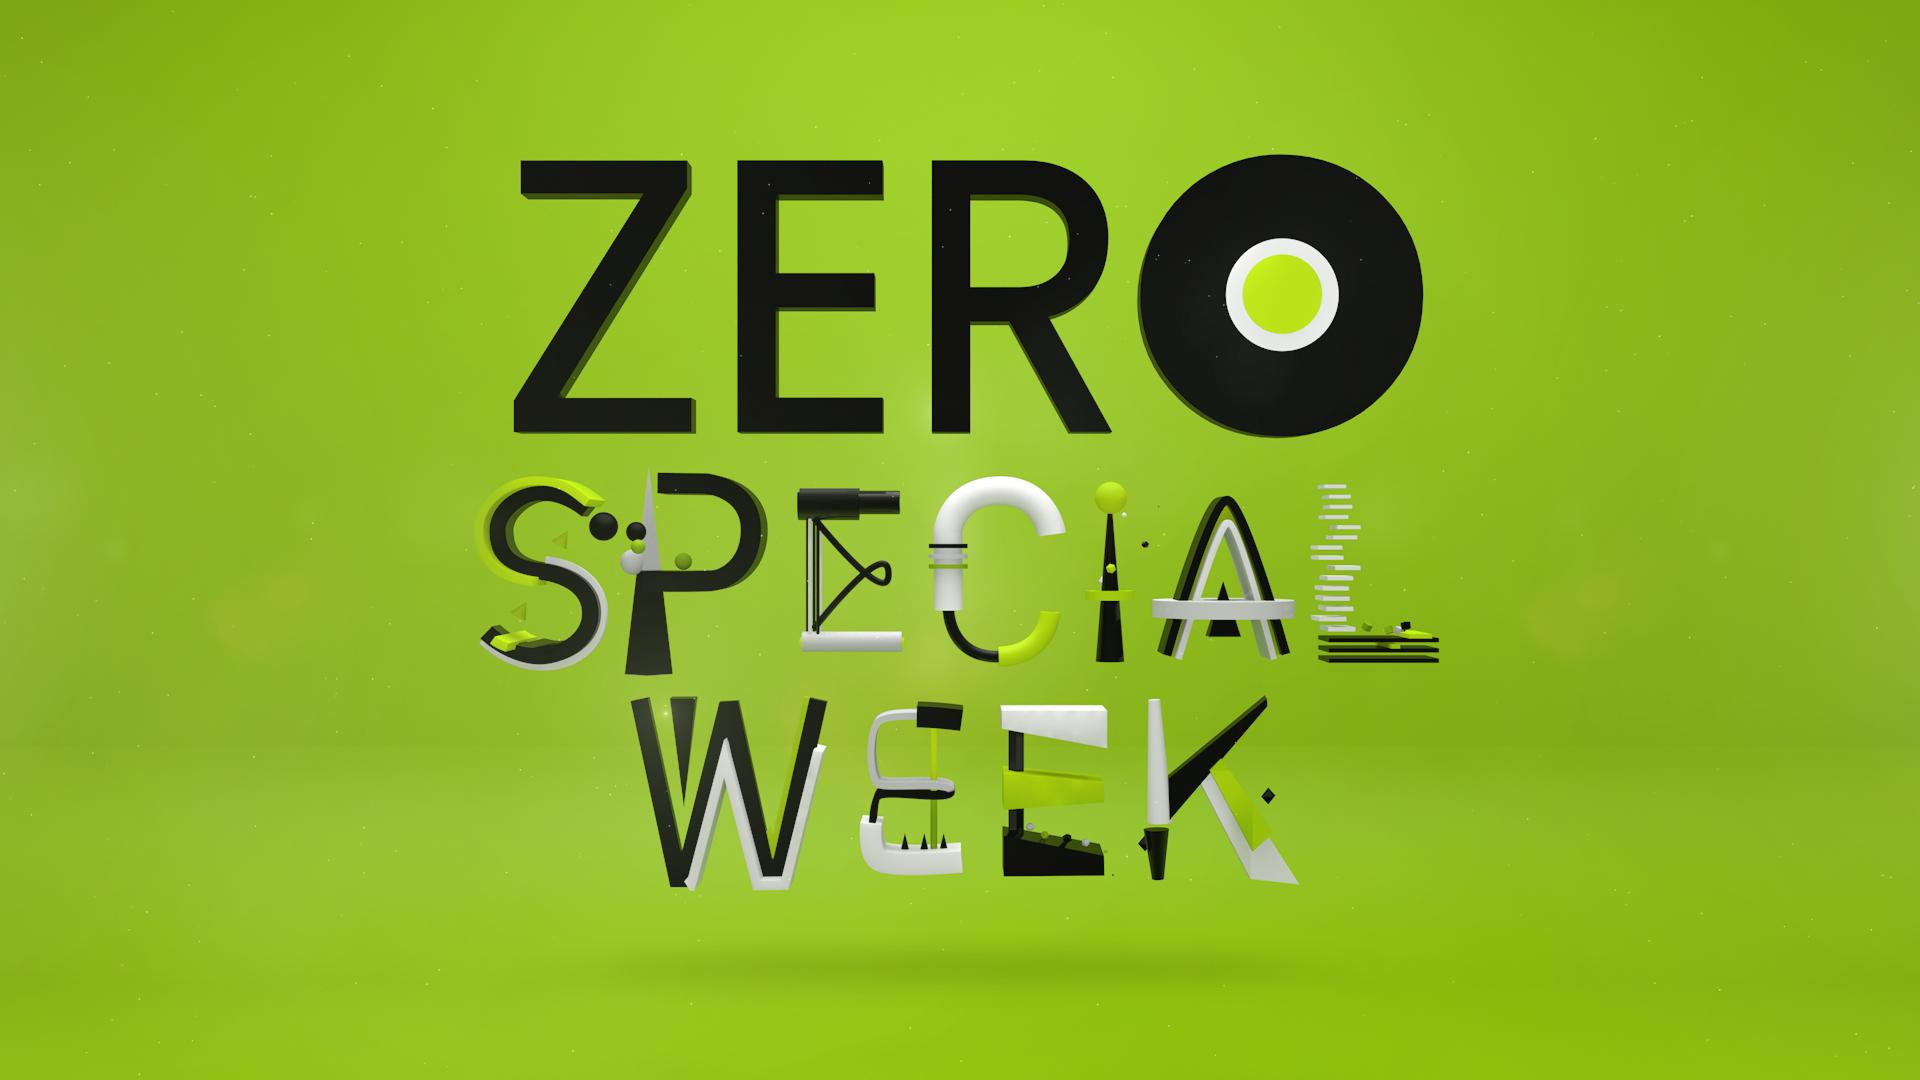 NEWS ZERO SpecialWeek 2013 Title